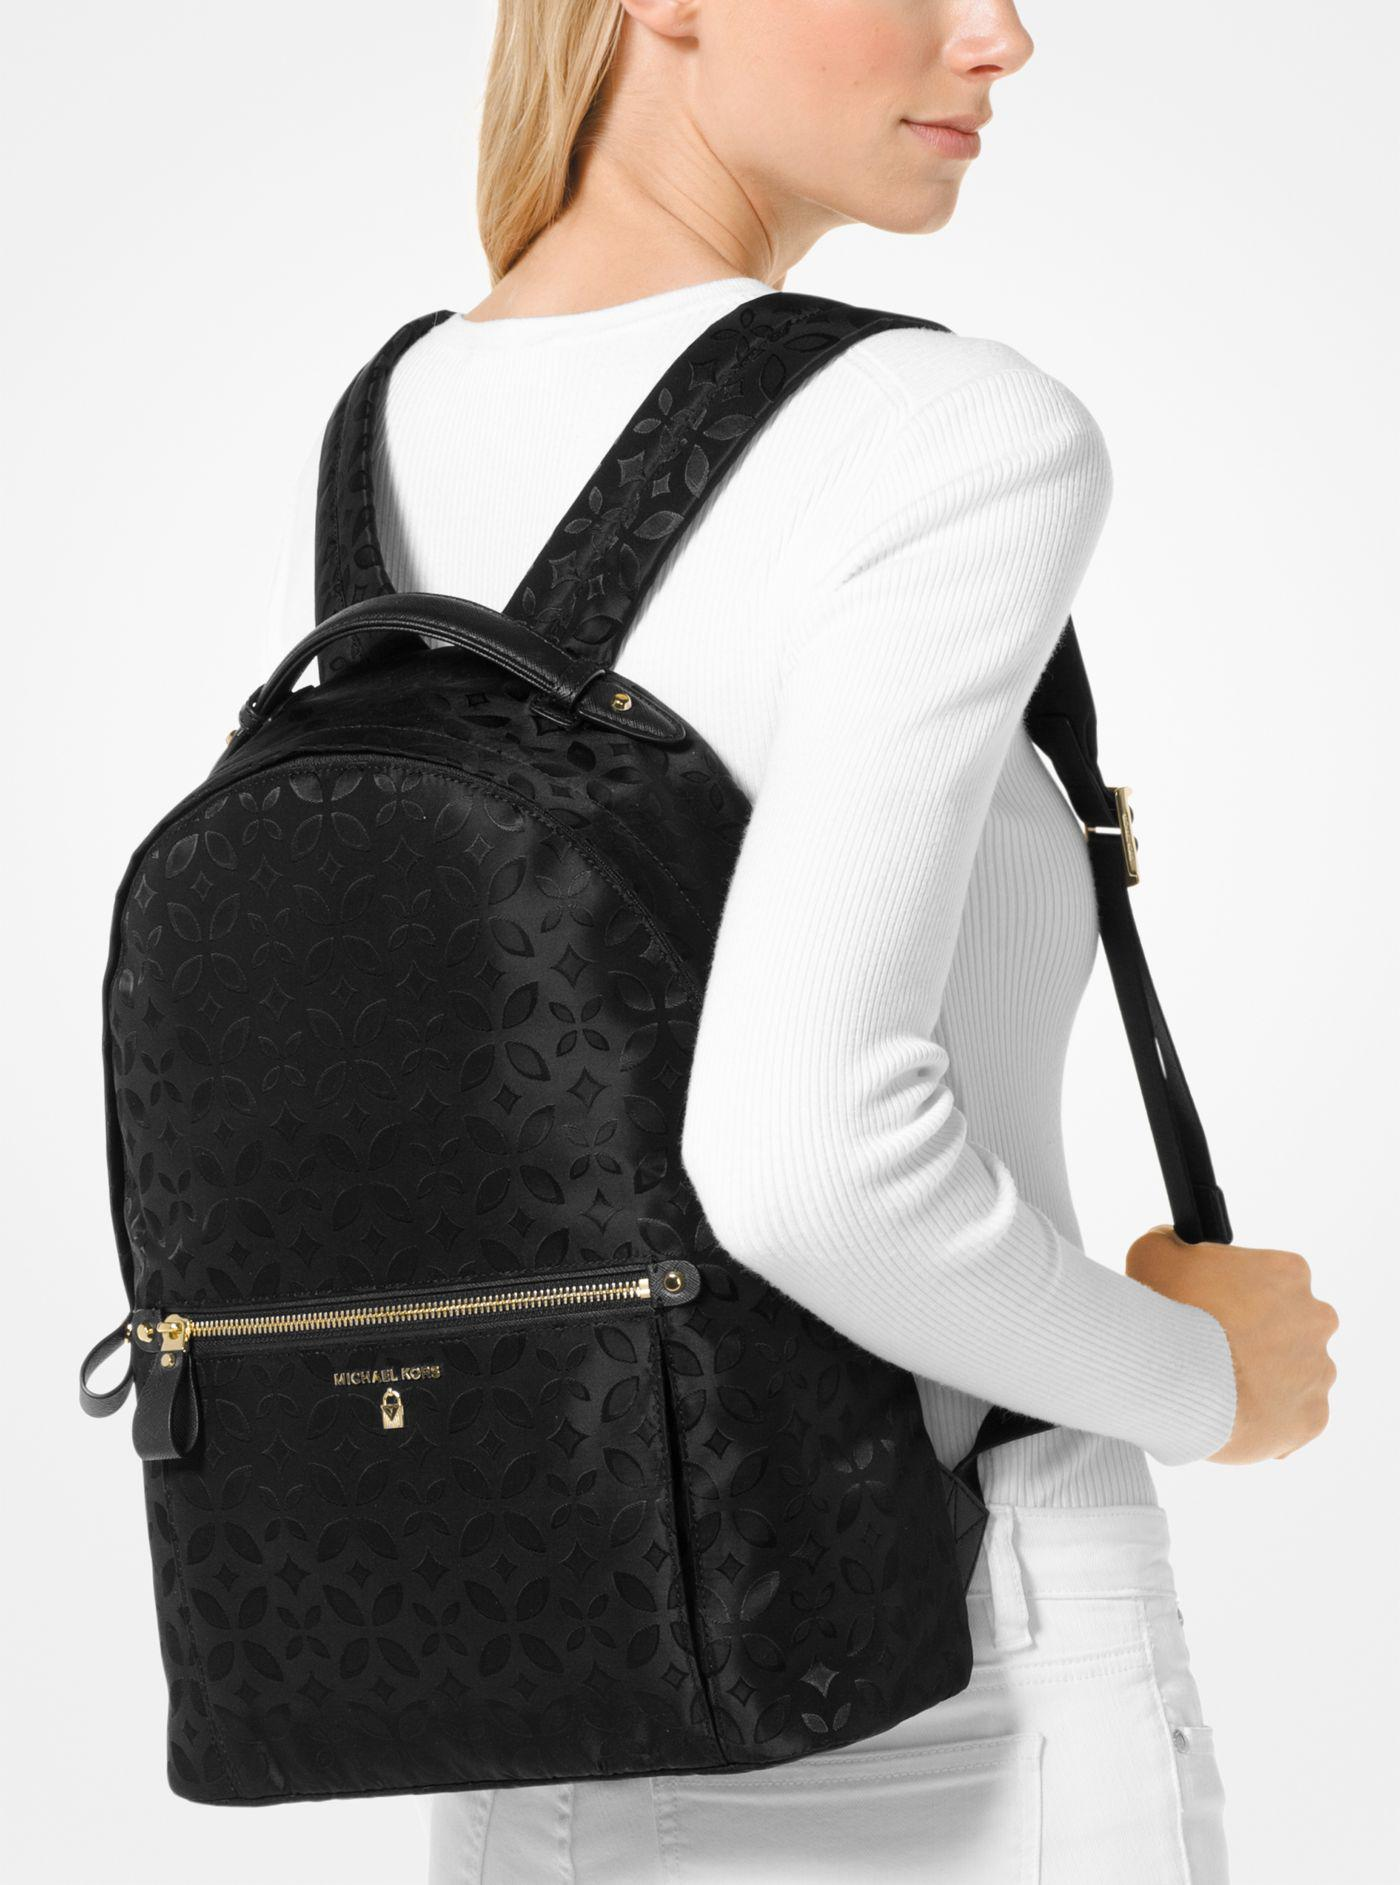 9146646d8c8633 Michael Kors Michael Nylon Kelsey Signature Backpack in Black - Lyst